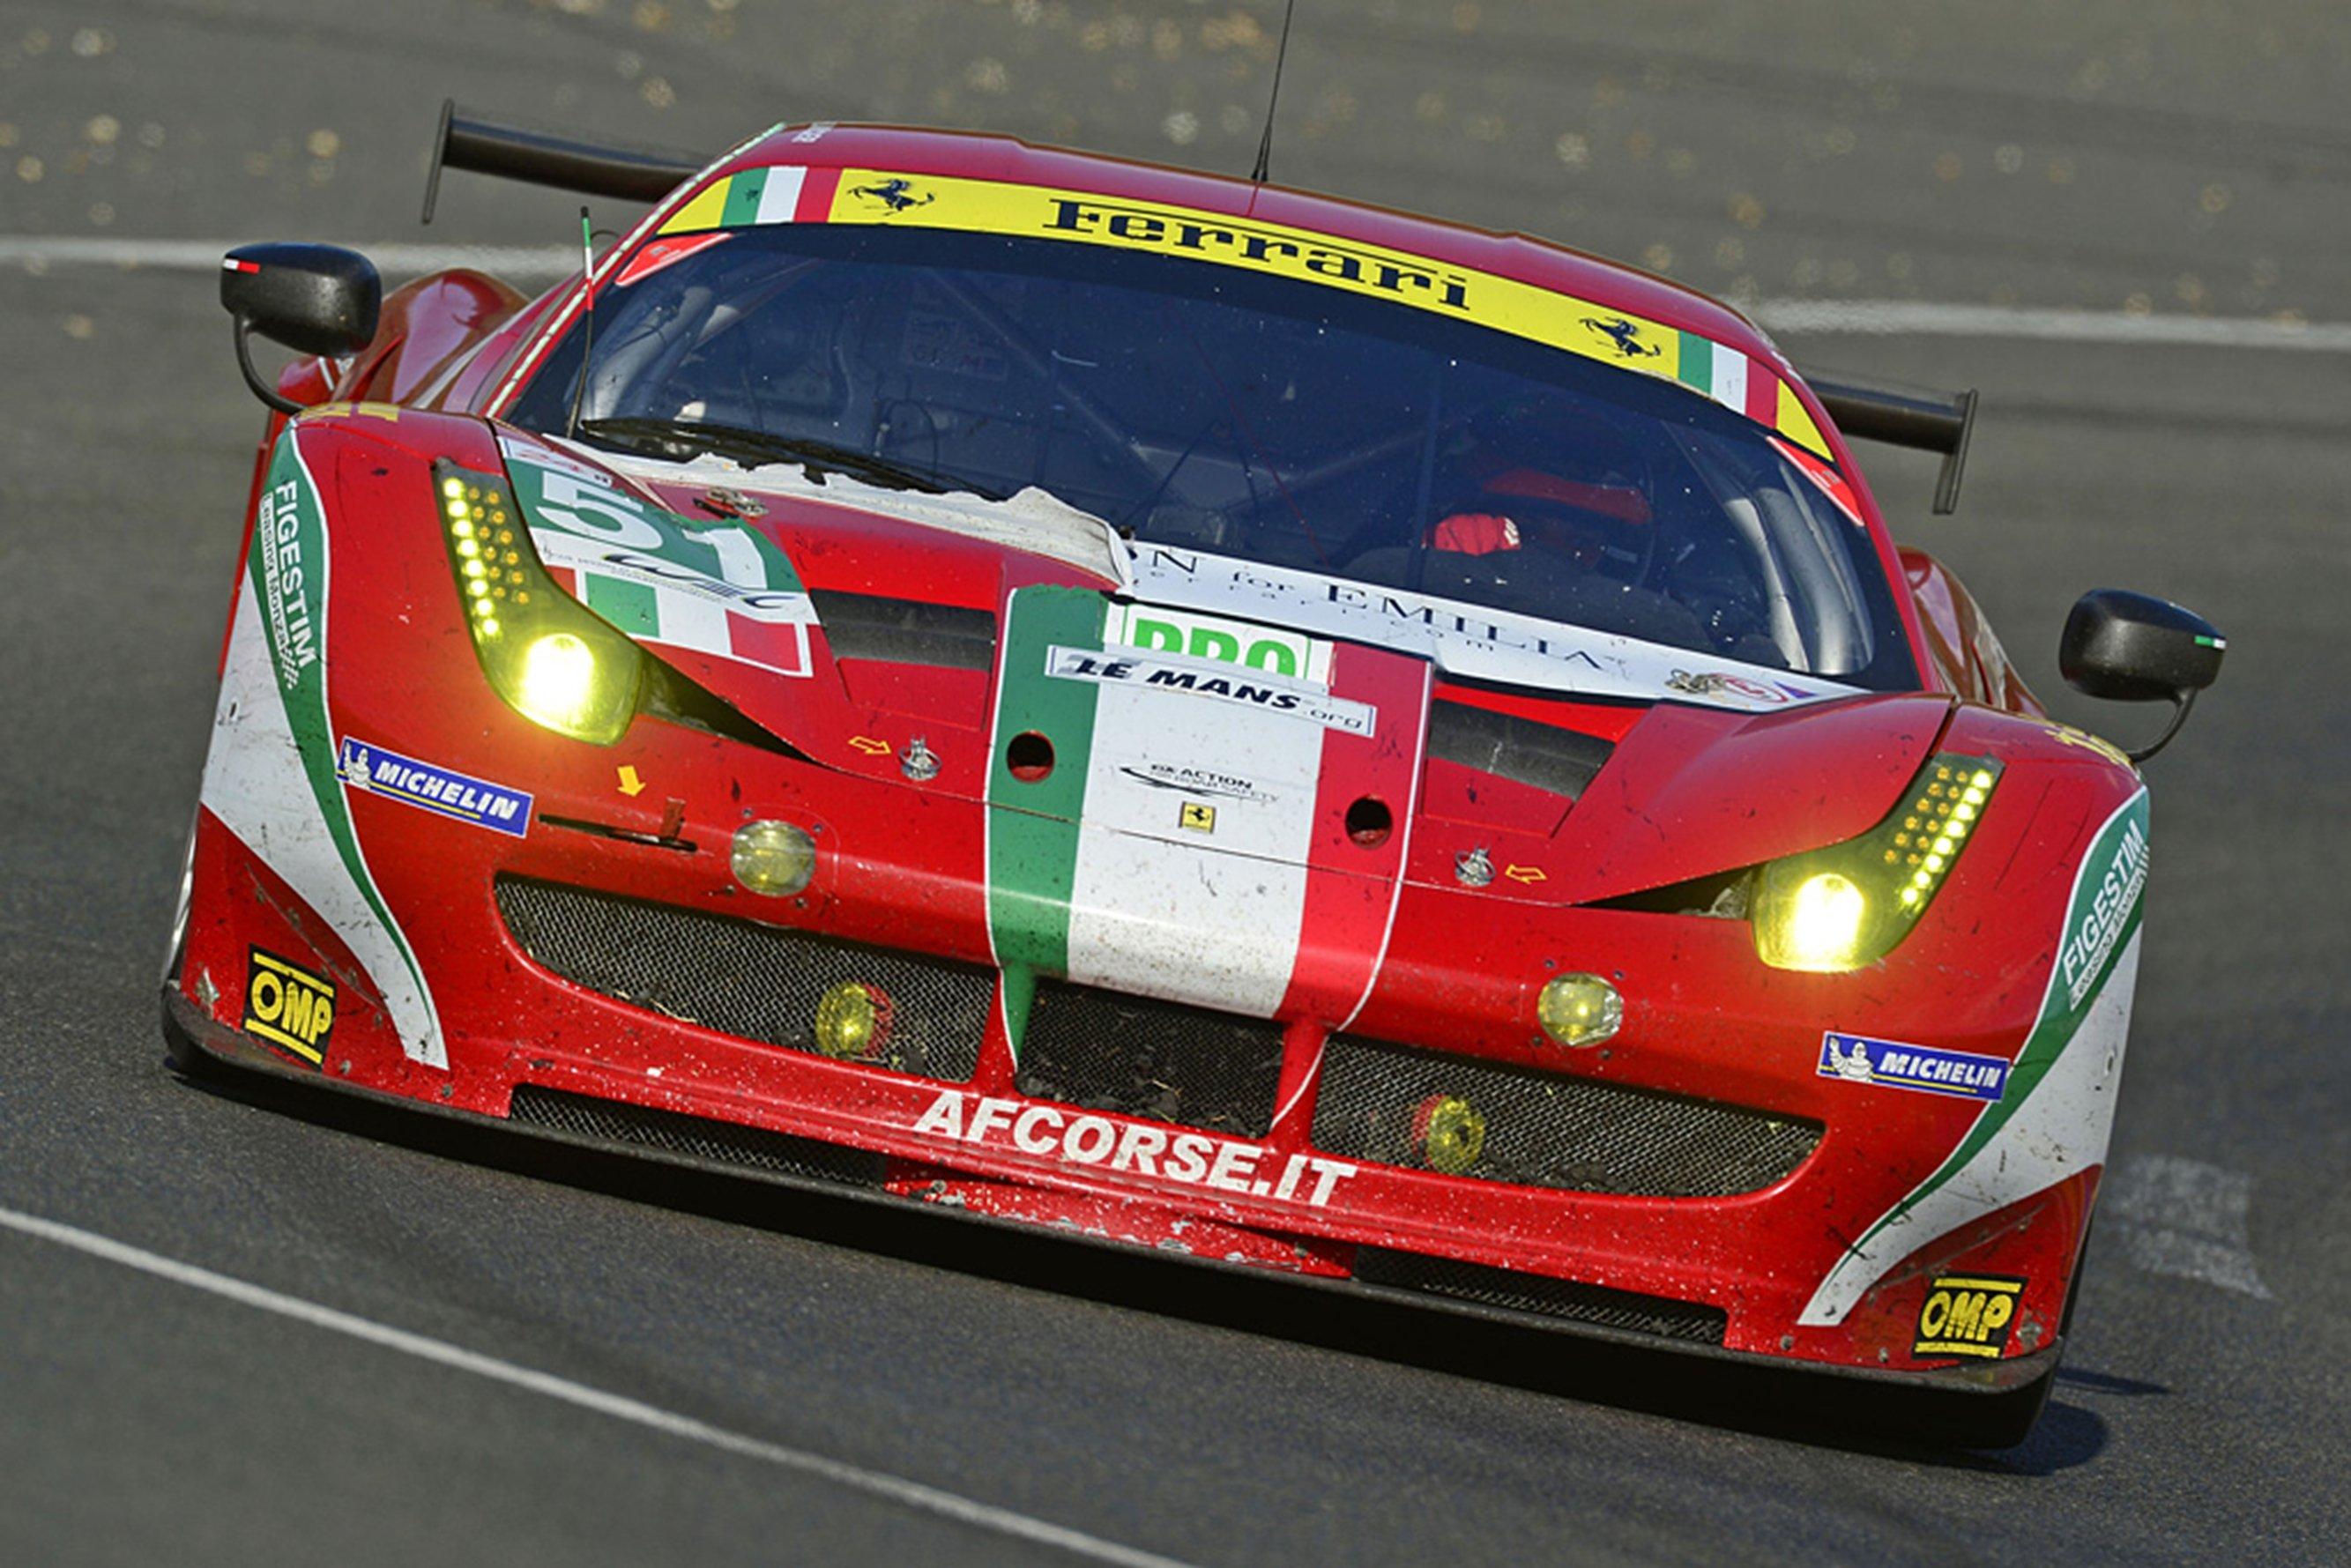 Race Car Supercar Racing Clic Ferrari Scuderia Corso Red Wallpaper 2667x1779 354255 Wallpaperup